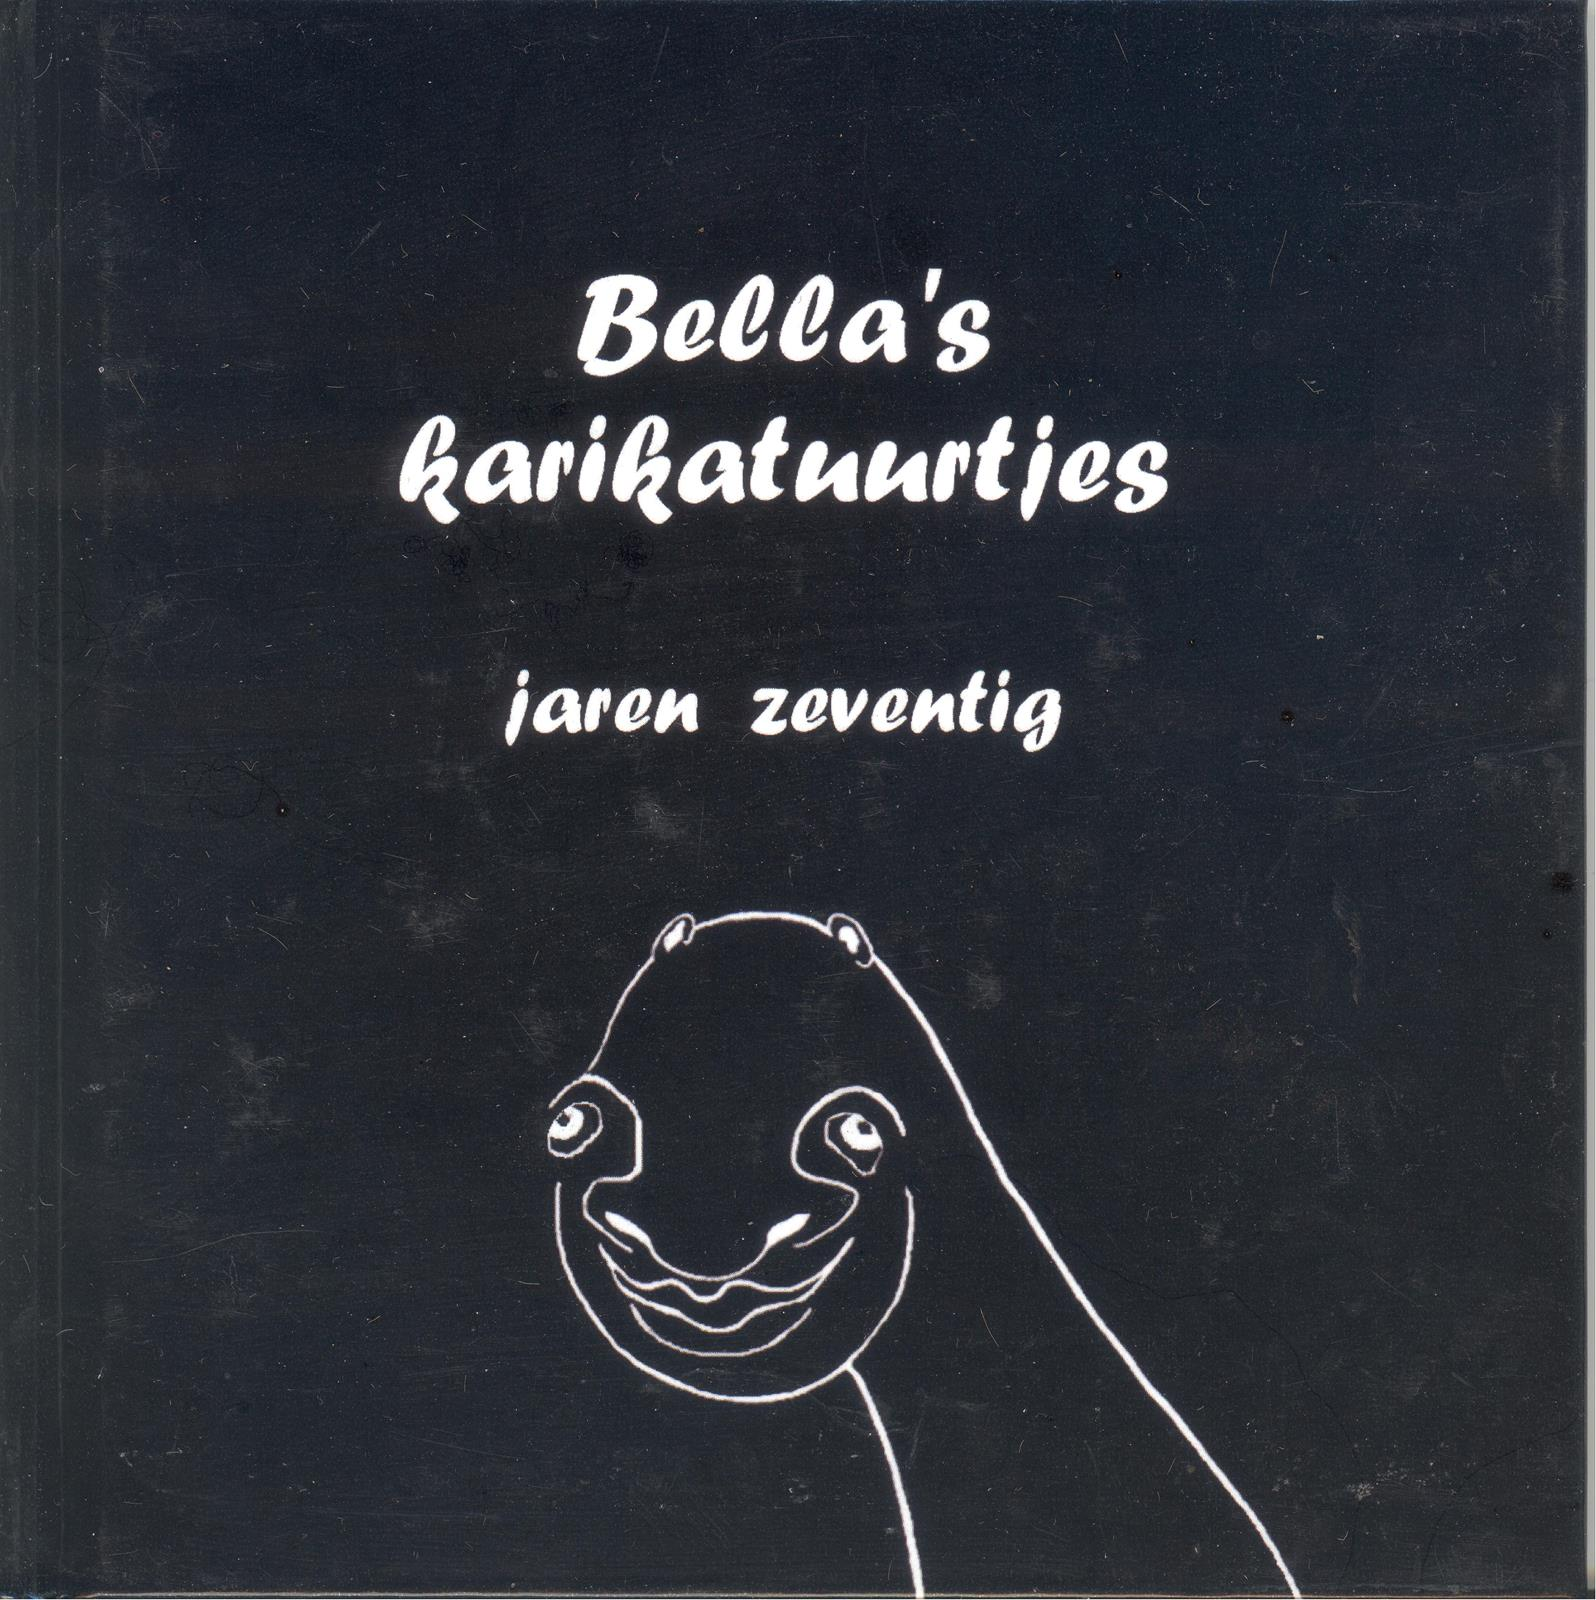 Bella's karikatuurtjes